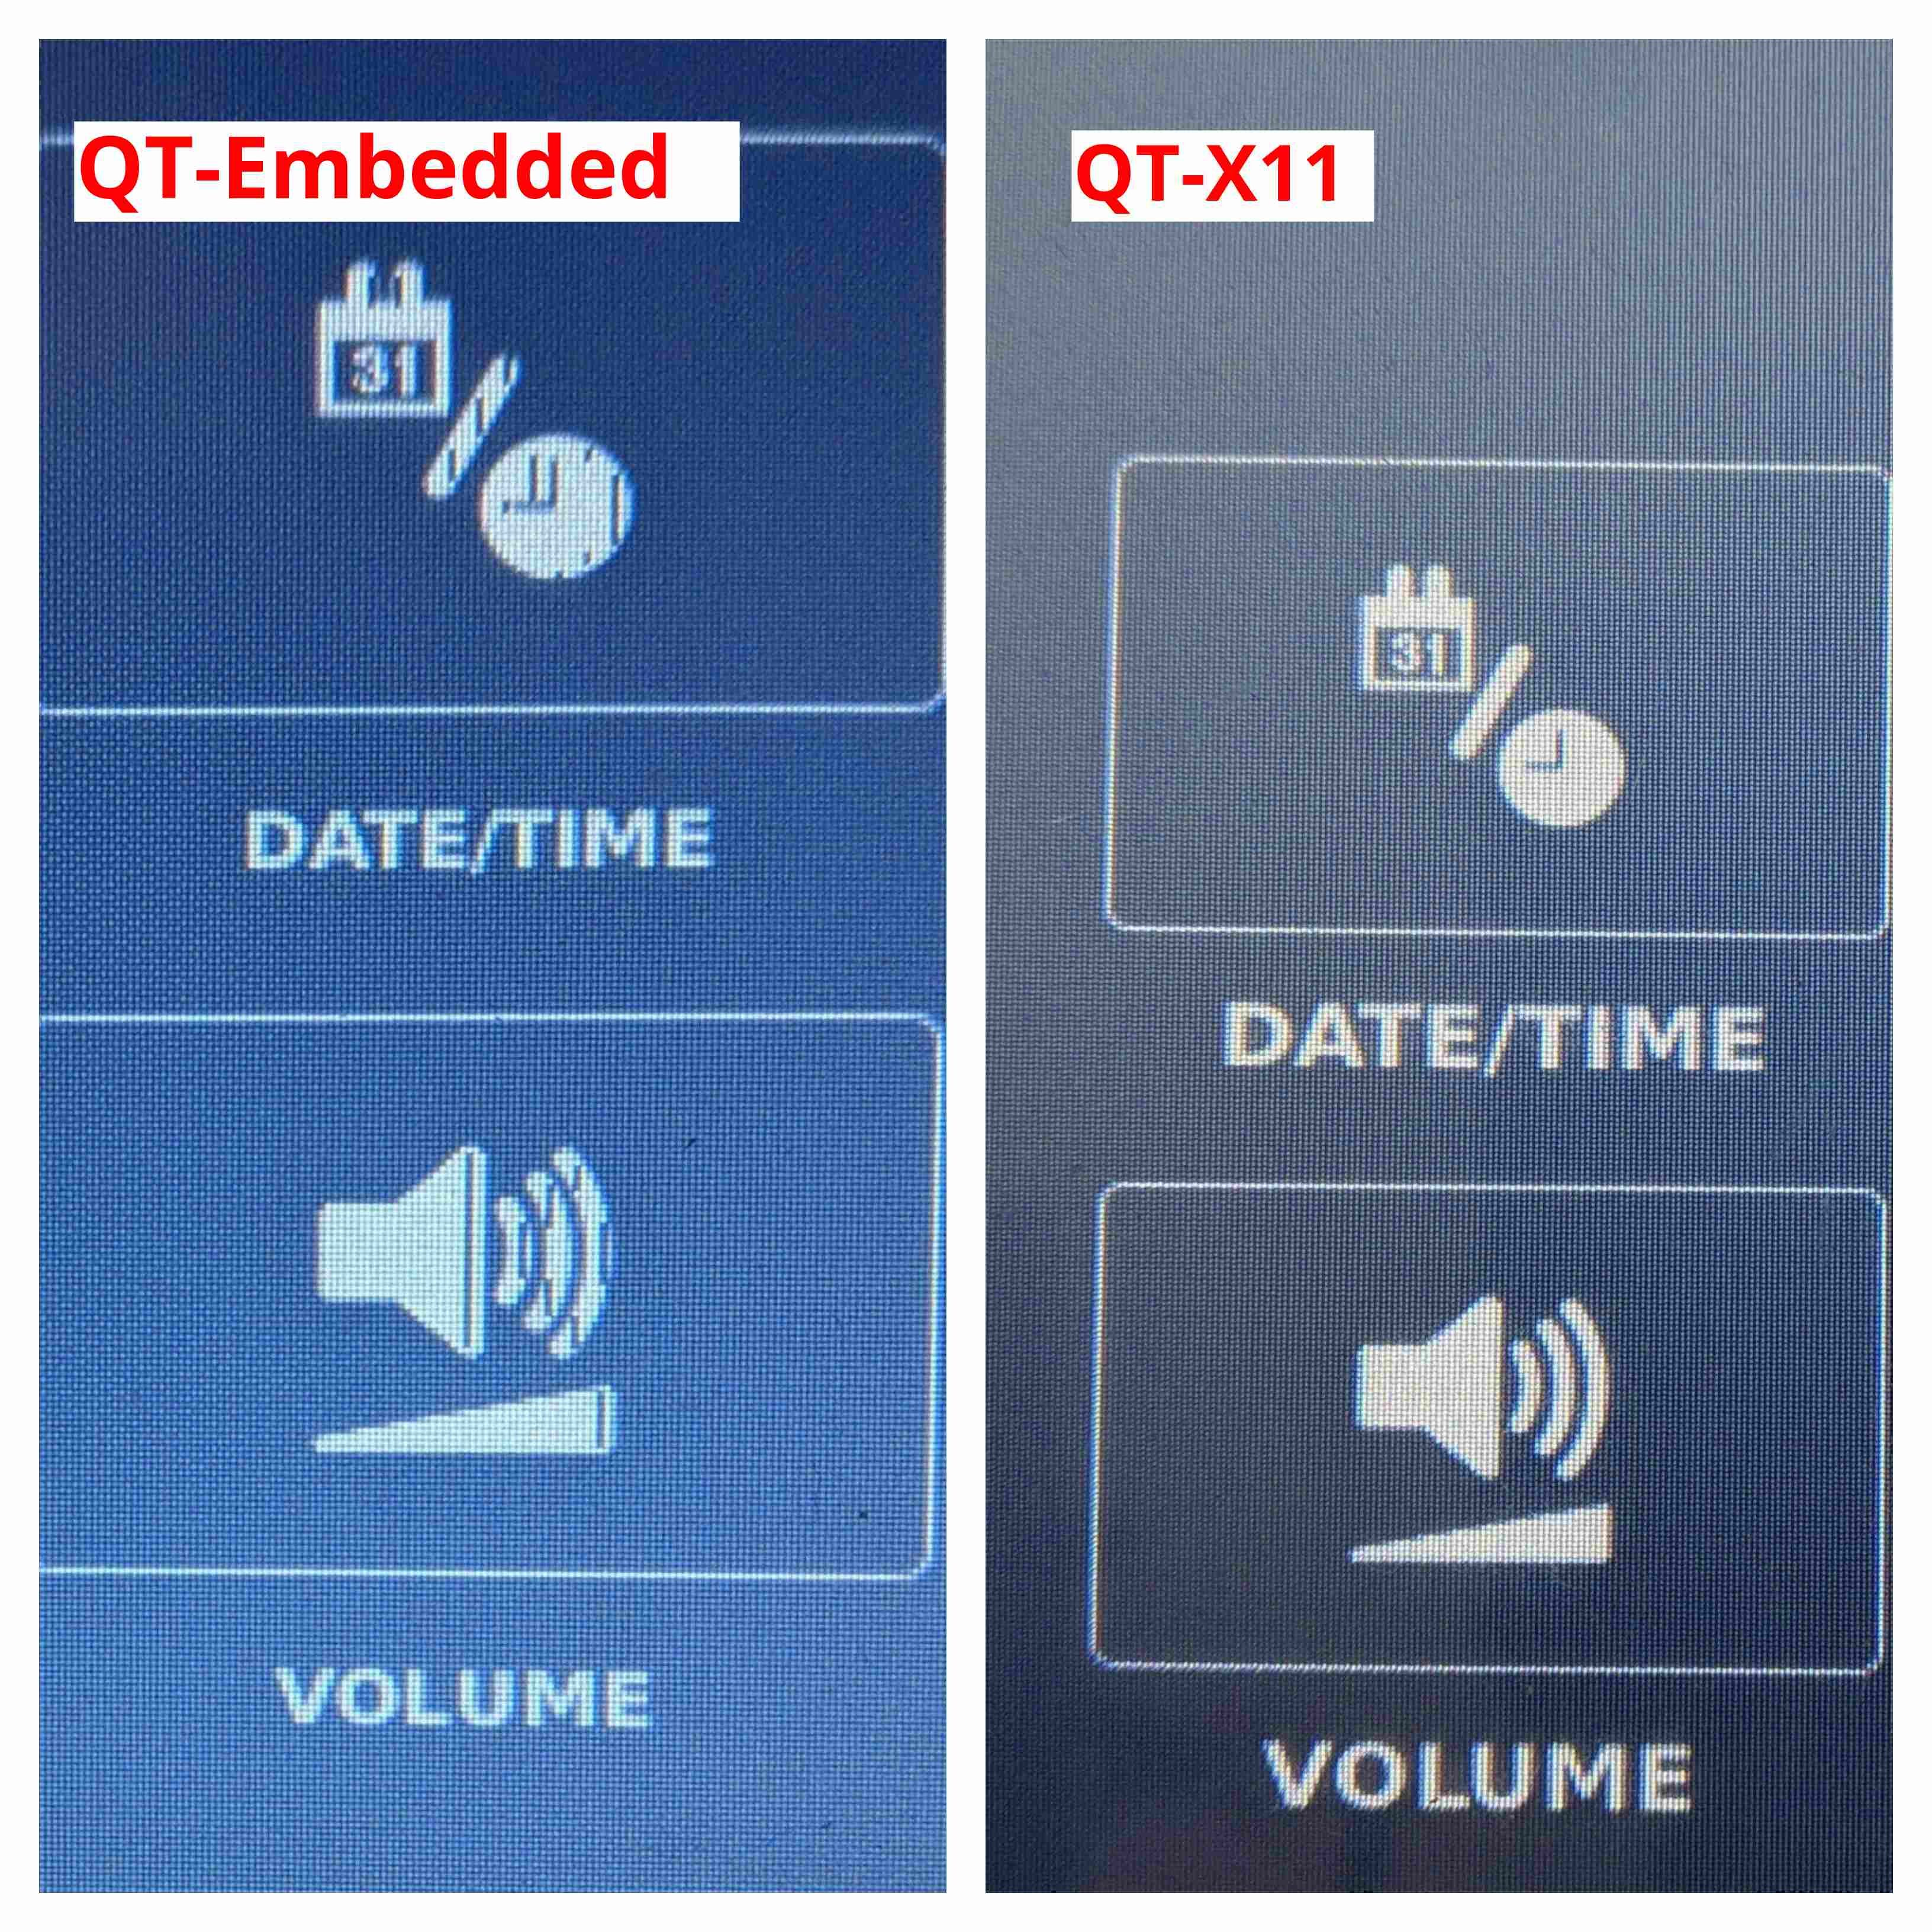 qte-vs-x11.jpg